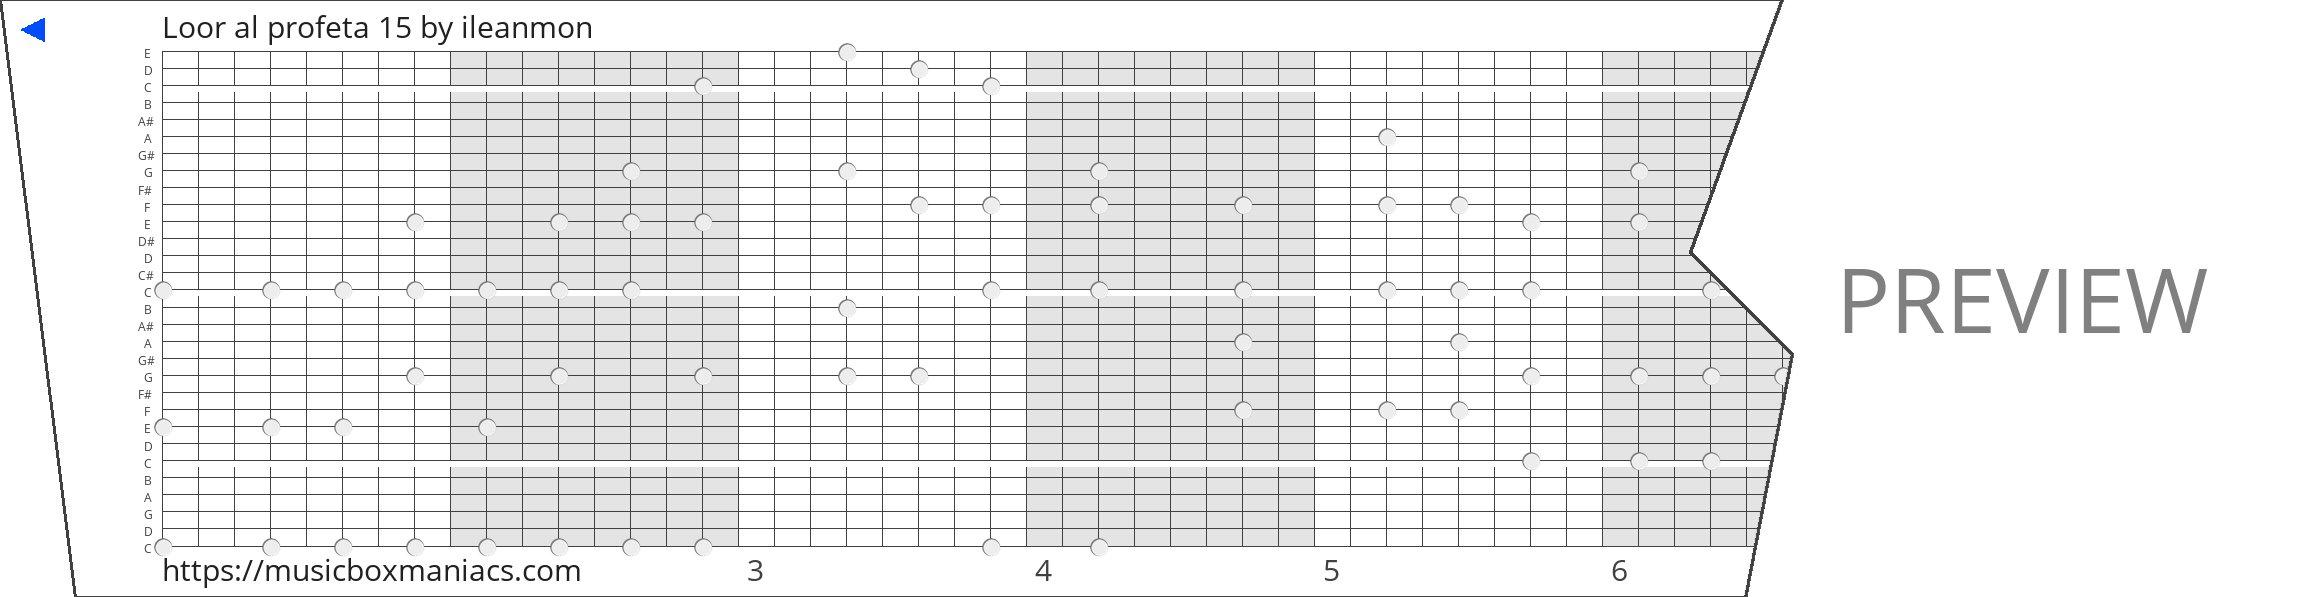 Loor al profeta 15 30 note music box paper strip